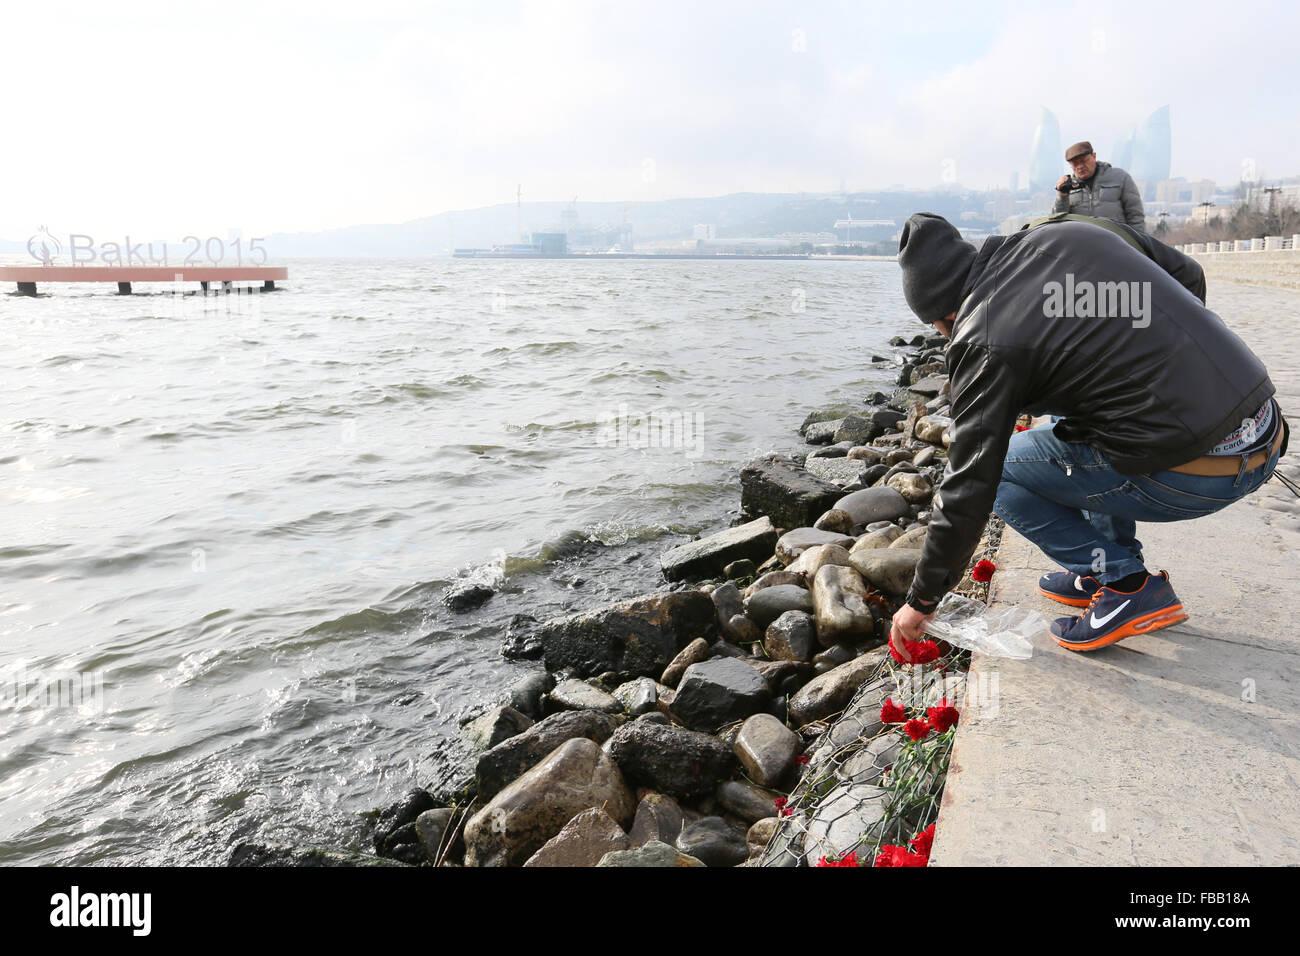 Baku, Azerbaijan  13th Jan, 2016  Young activists mark the 40th day